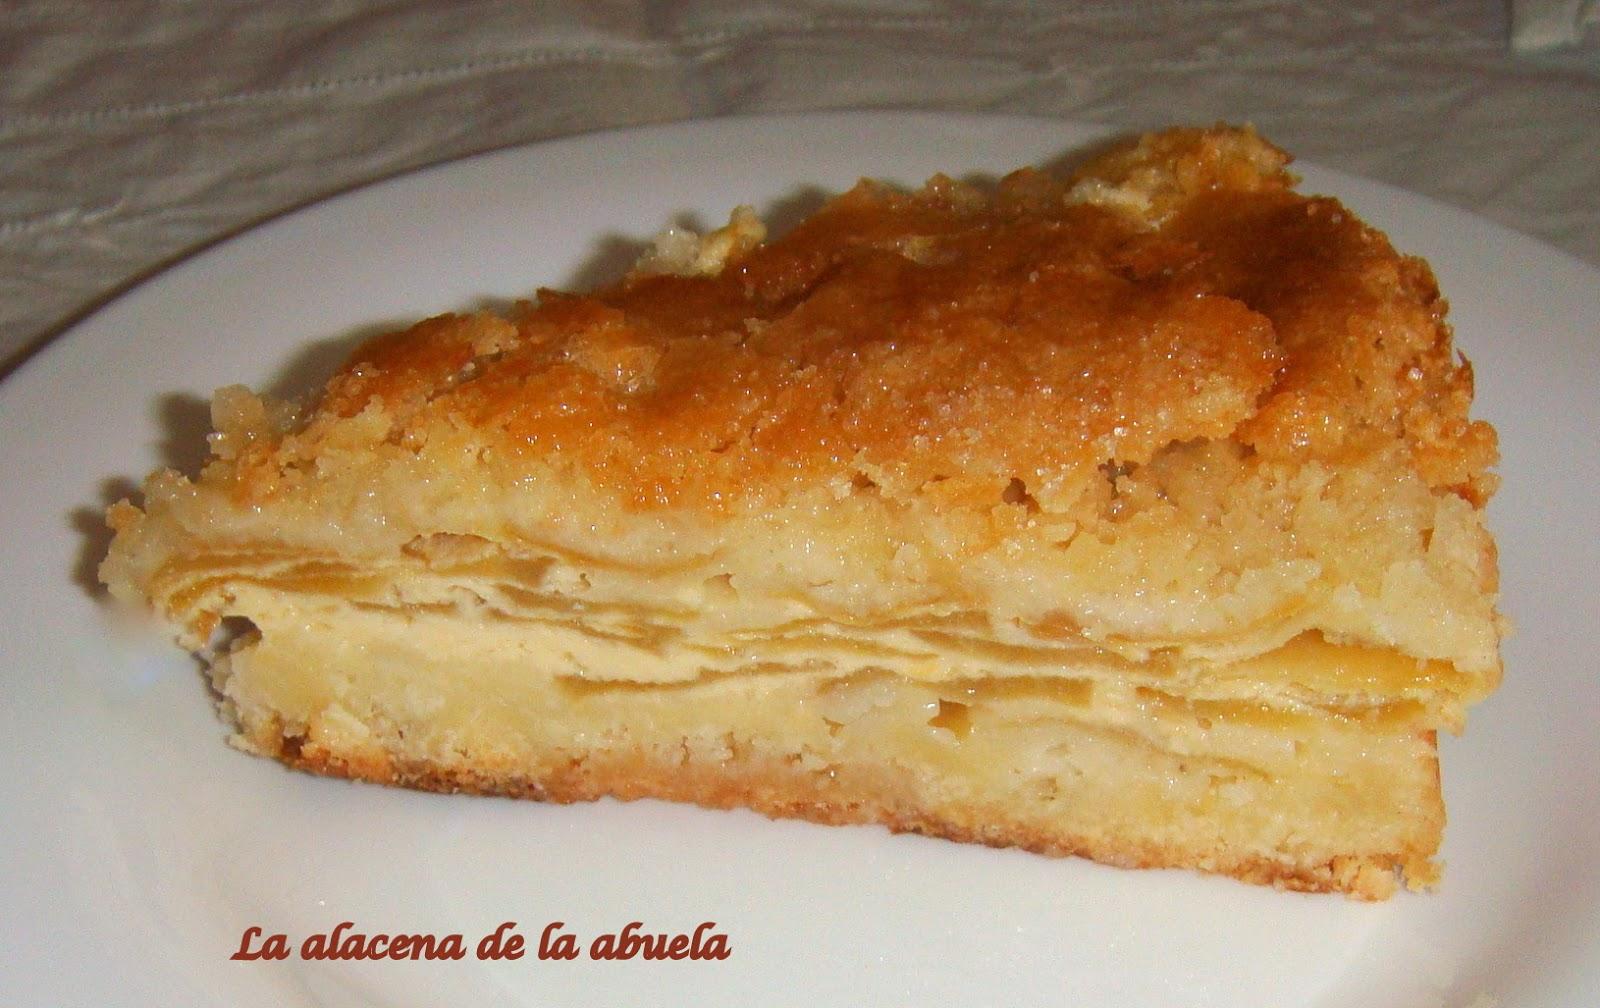 La alacena de la abuela carmen torta m gica de la hermana for Cocina casera de la abuela